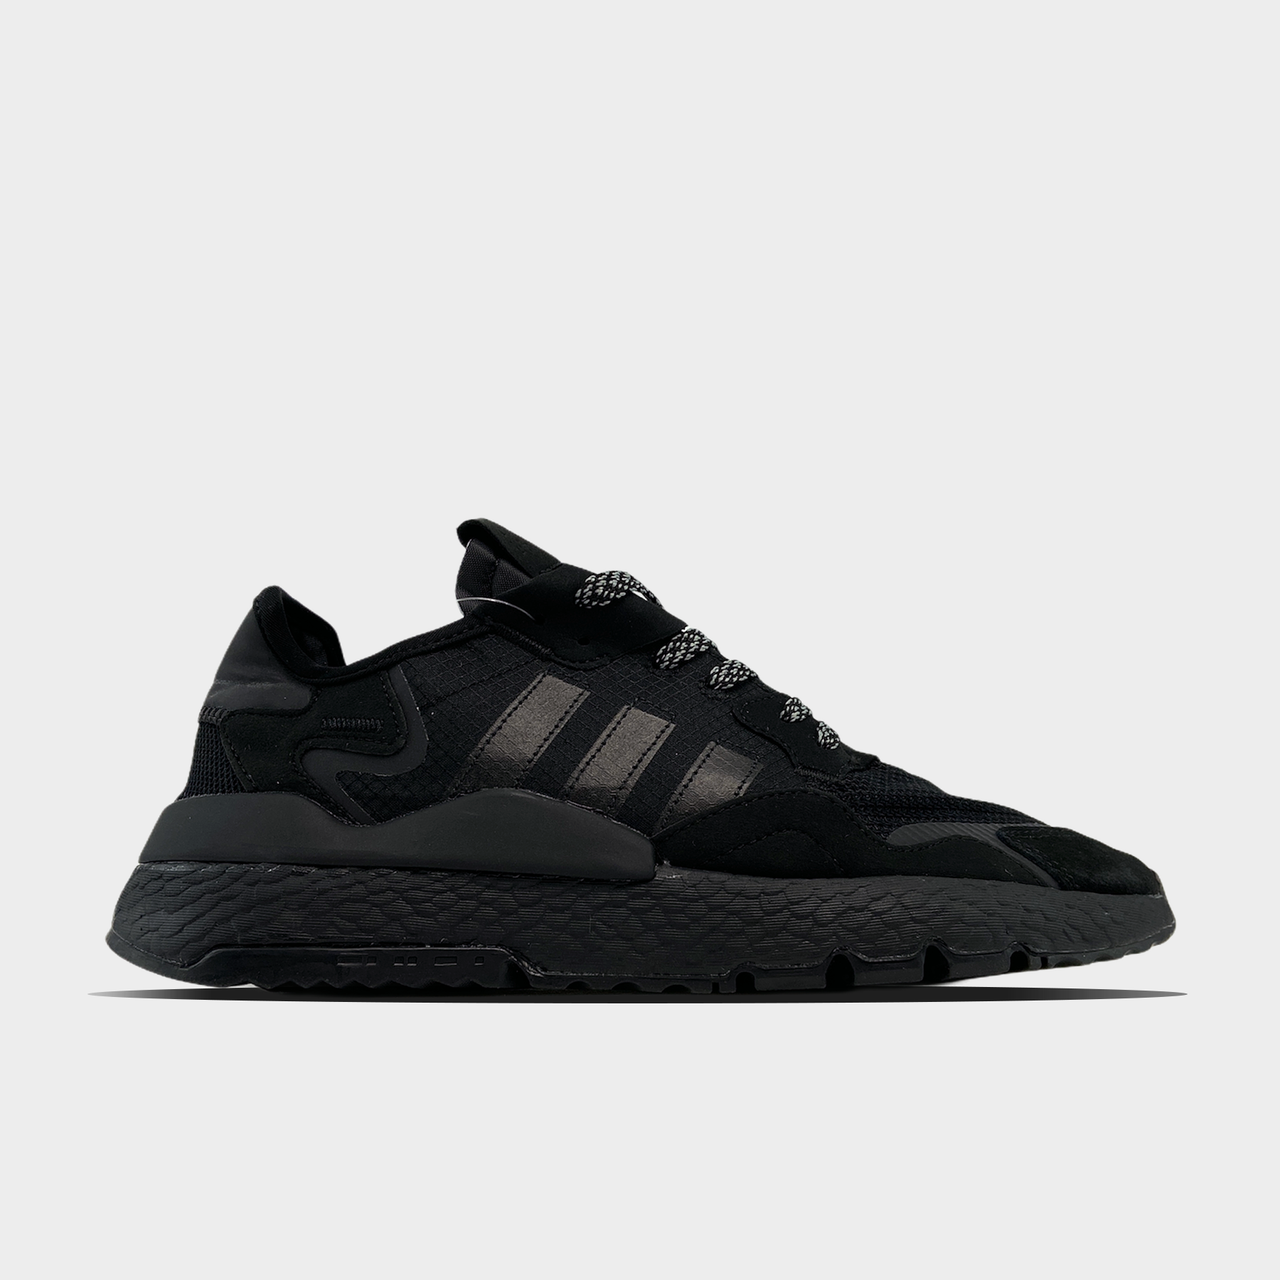 Ad!id@s, крос, обувь, взуття, sneakers, шузы, Nite Jogger Triple Black (Черный)